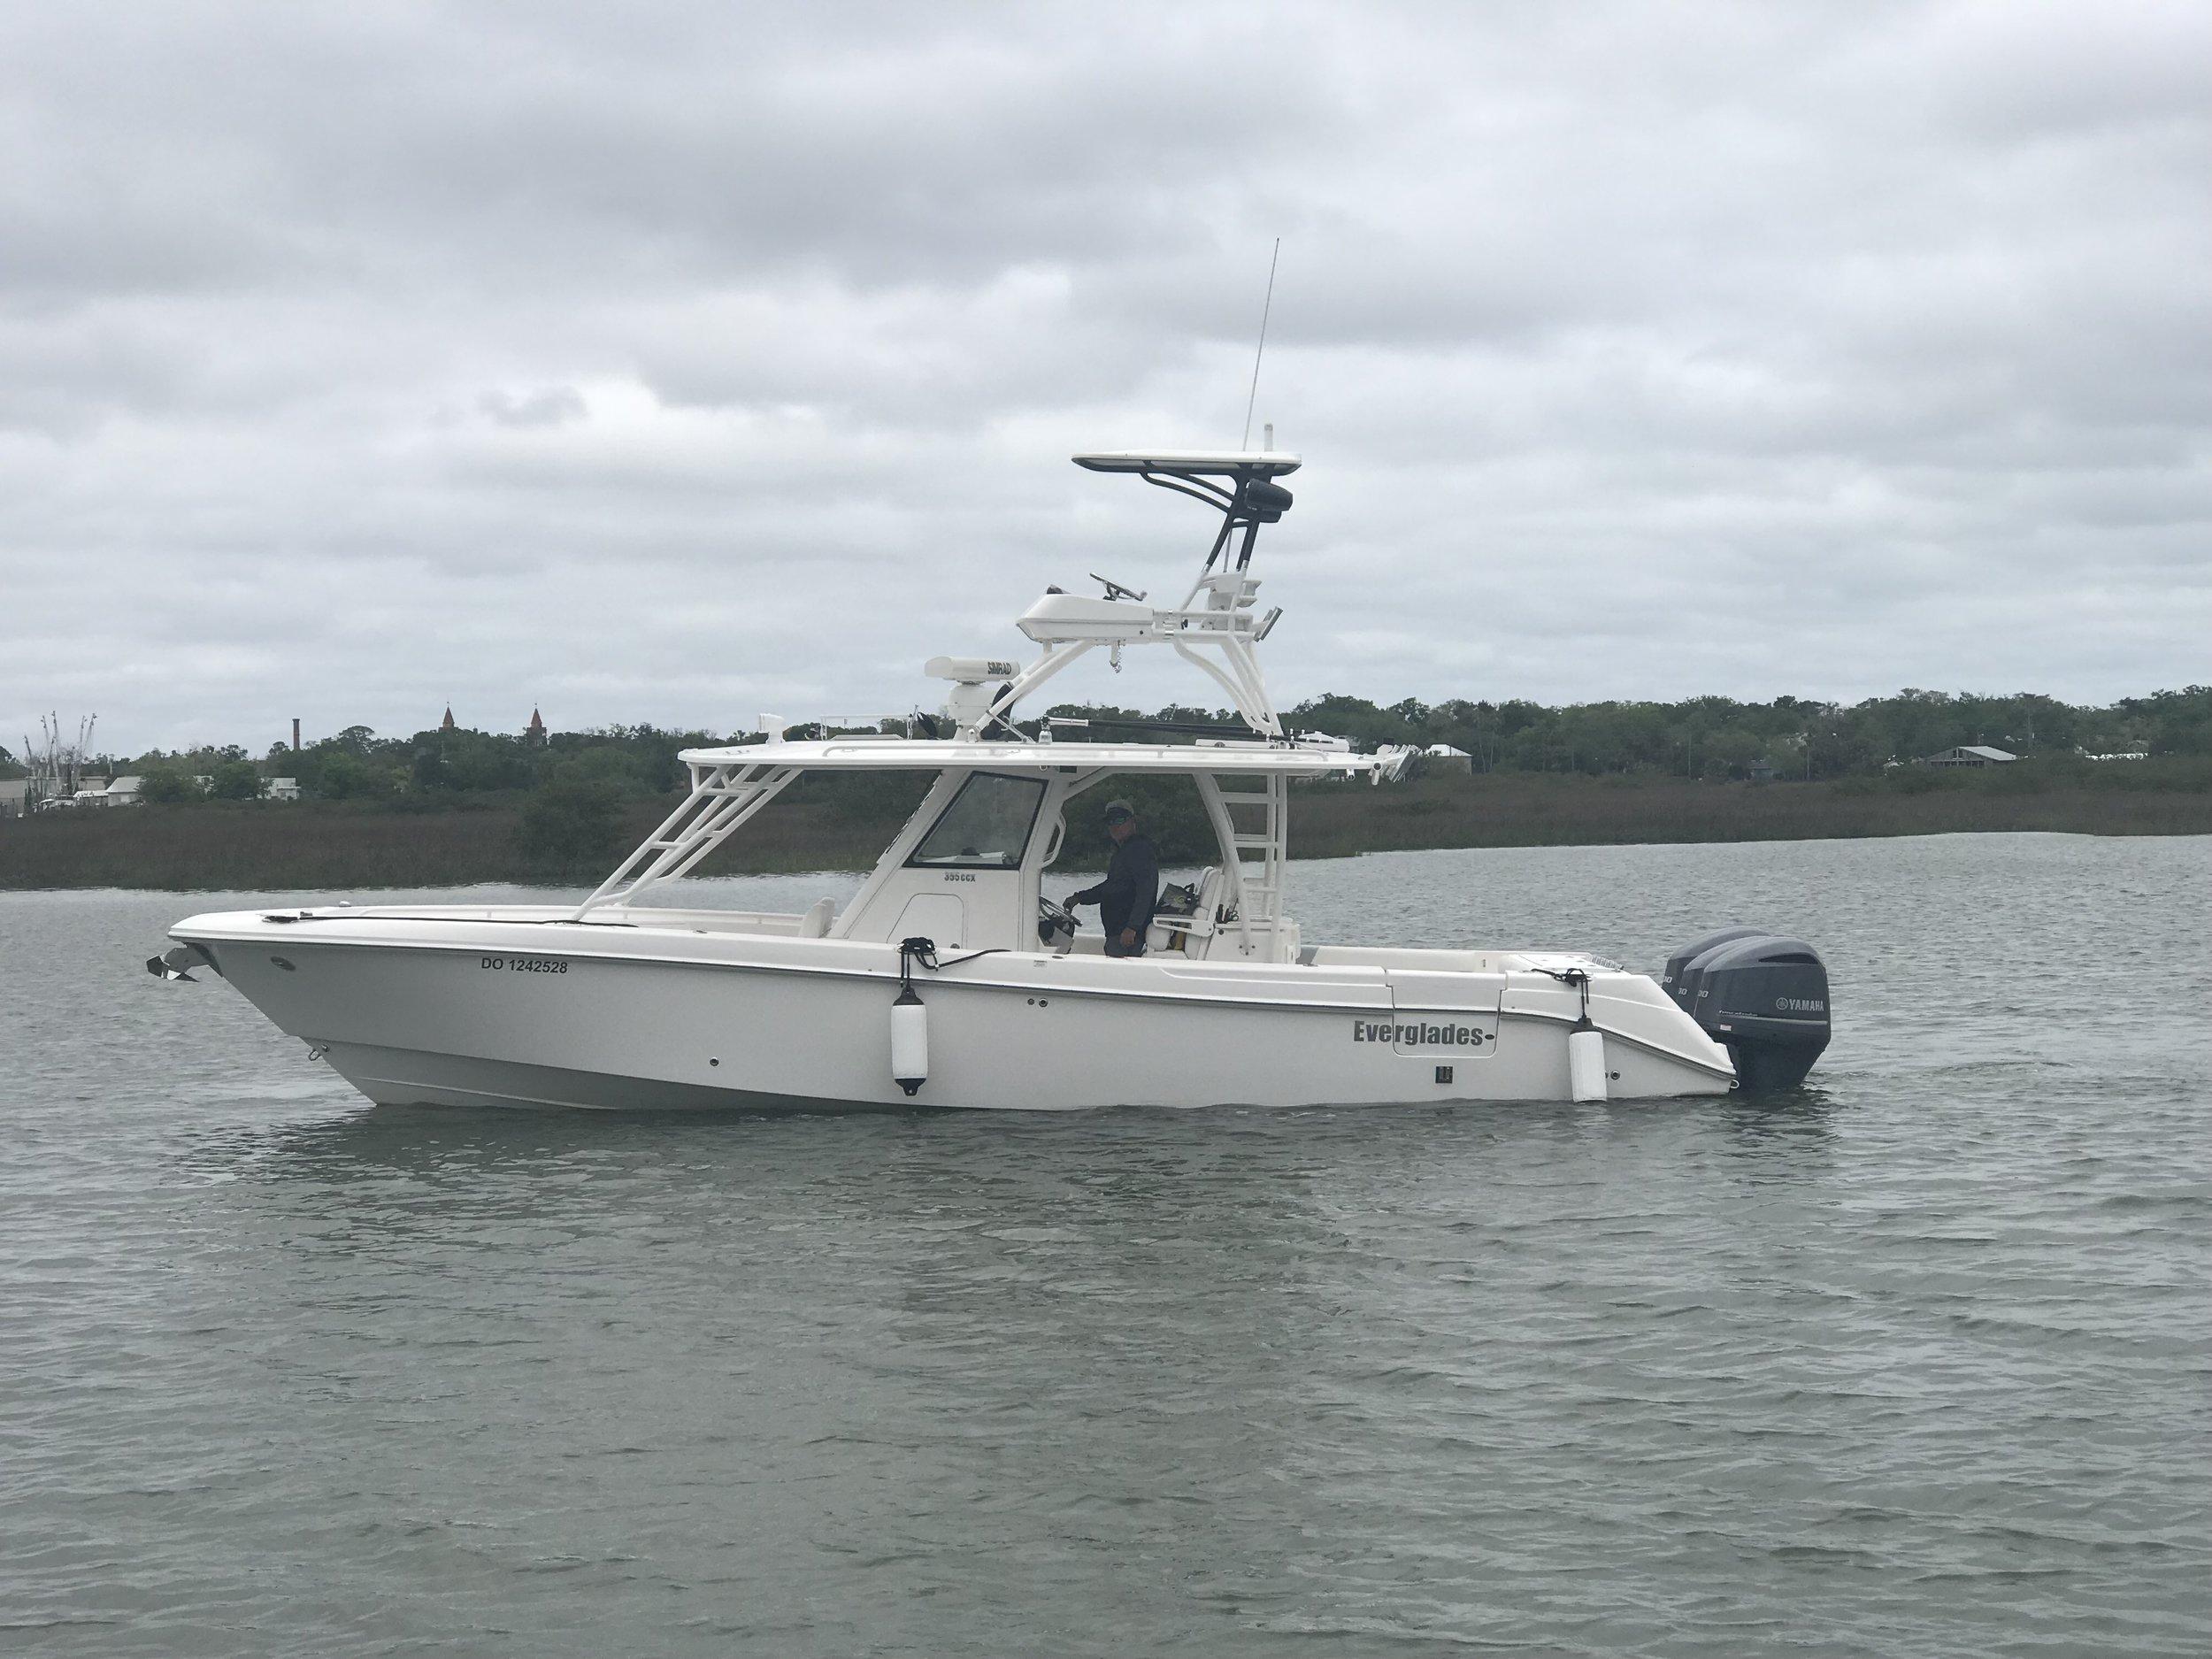 35ft Everglades luxury center console